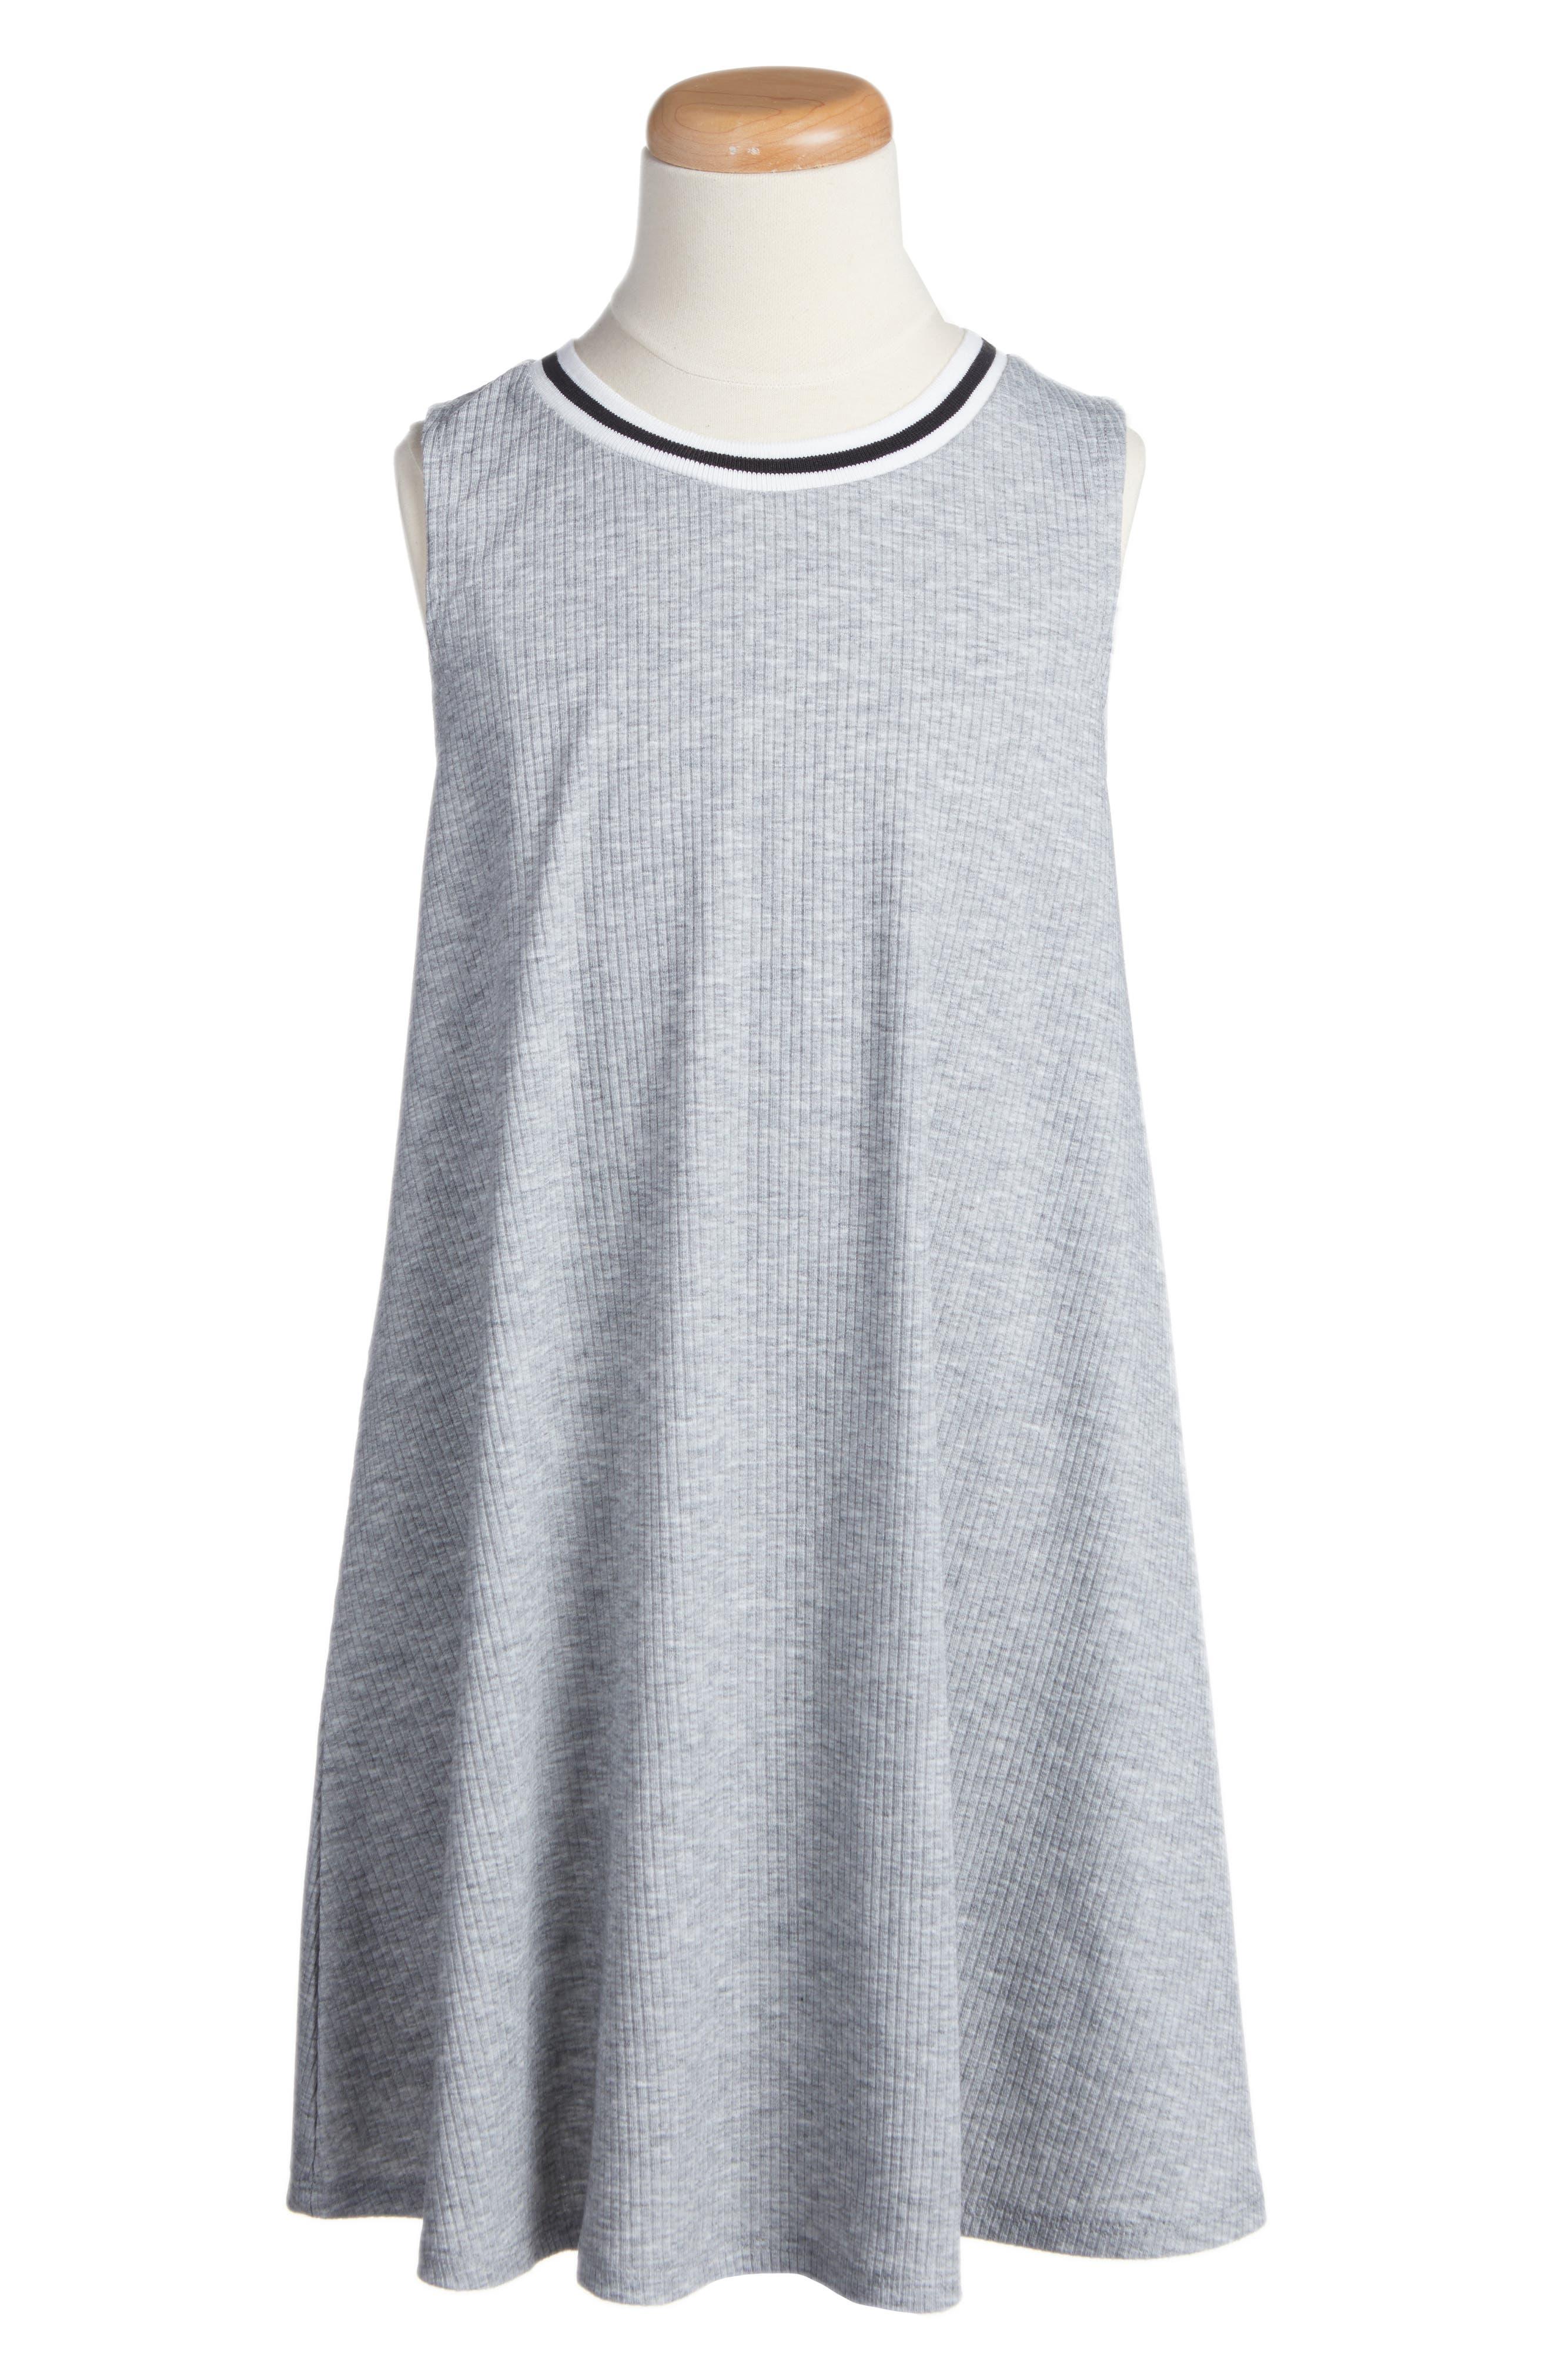 Ringer Tank Dress,                             Main thumbnail 1, color,                             Heather Gray